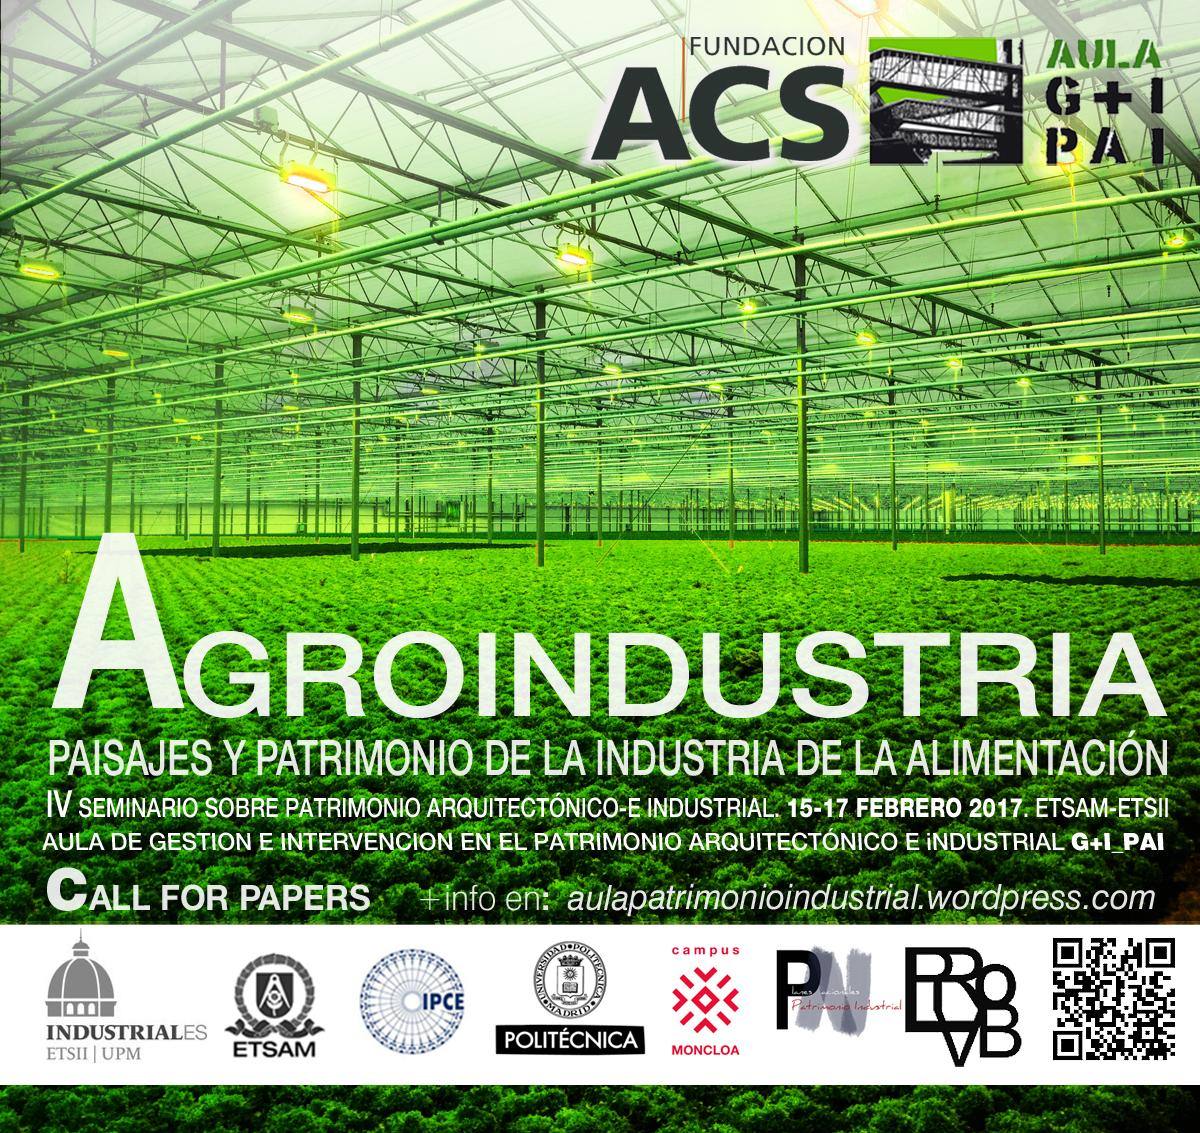 IV Seminario G+I_PAI. Agroindustria